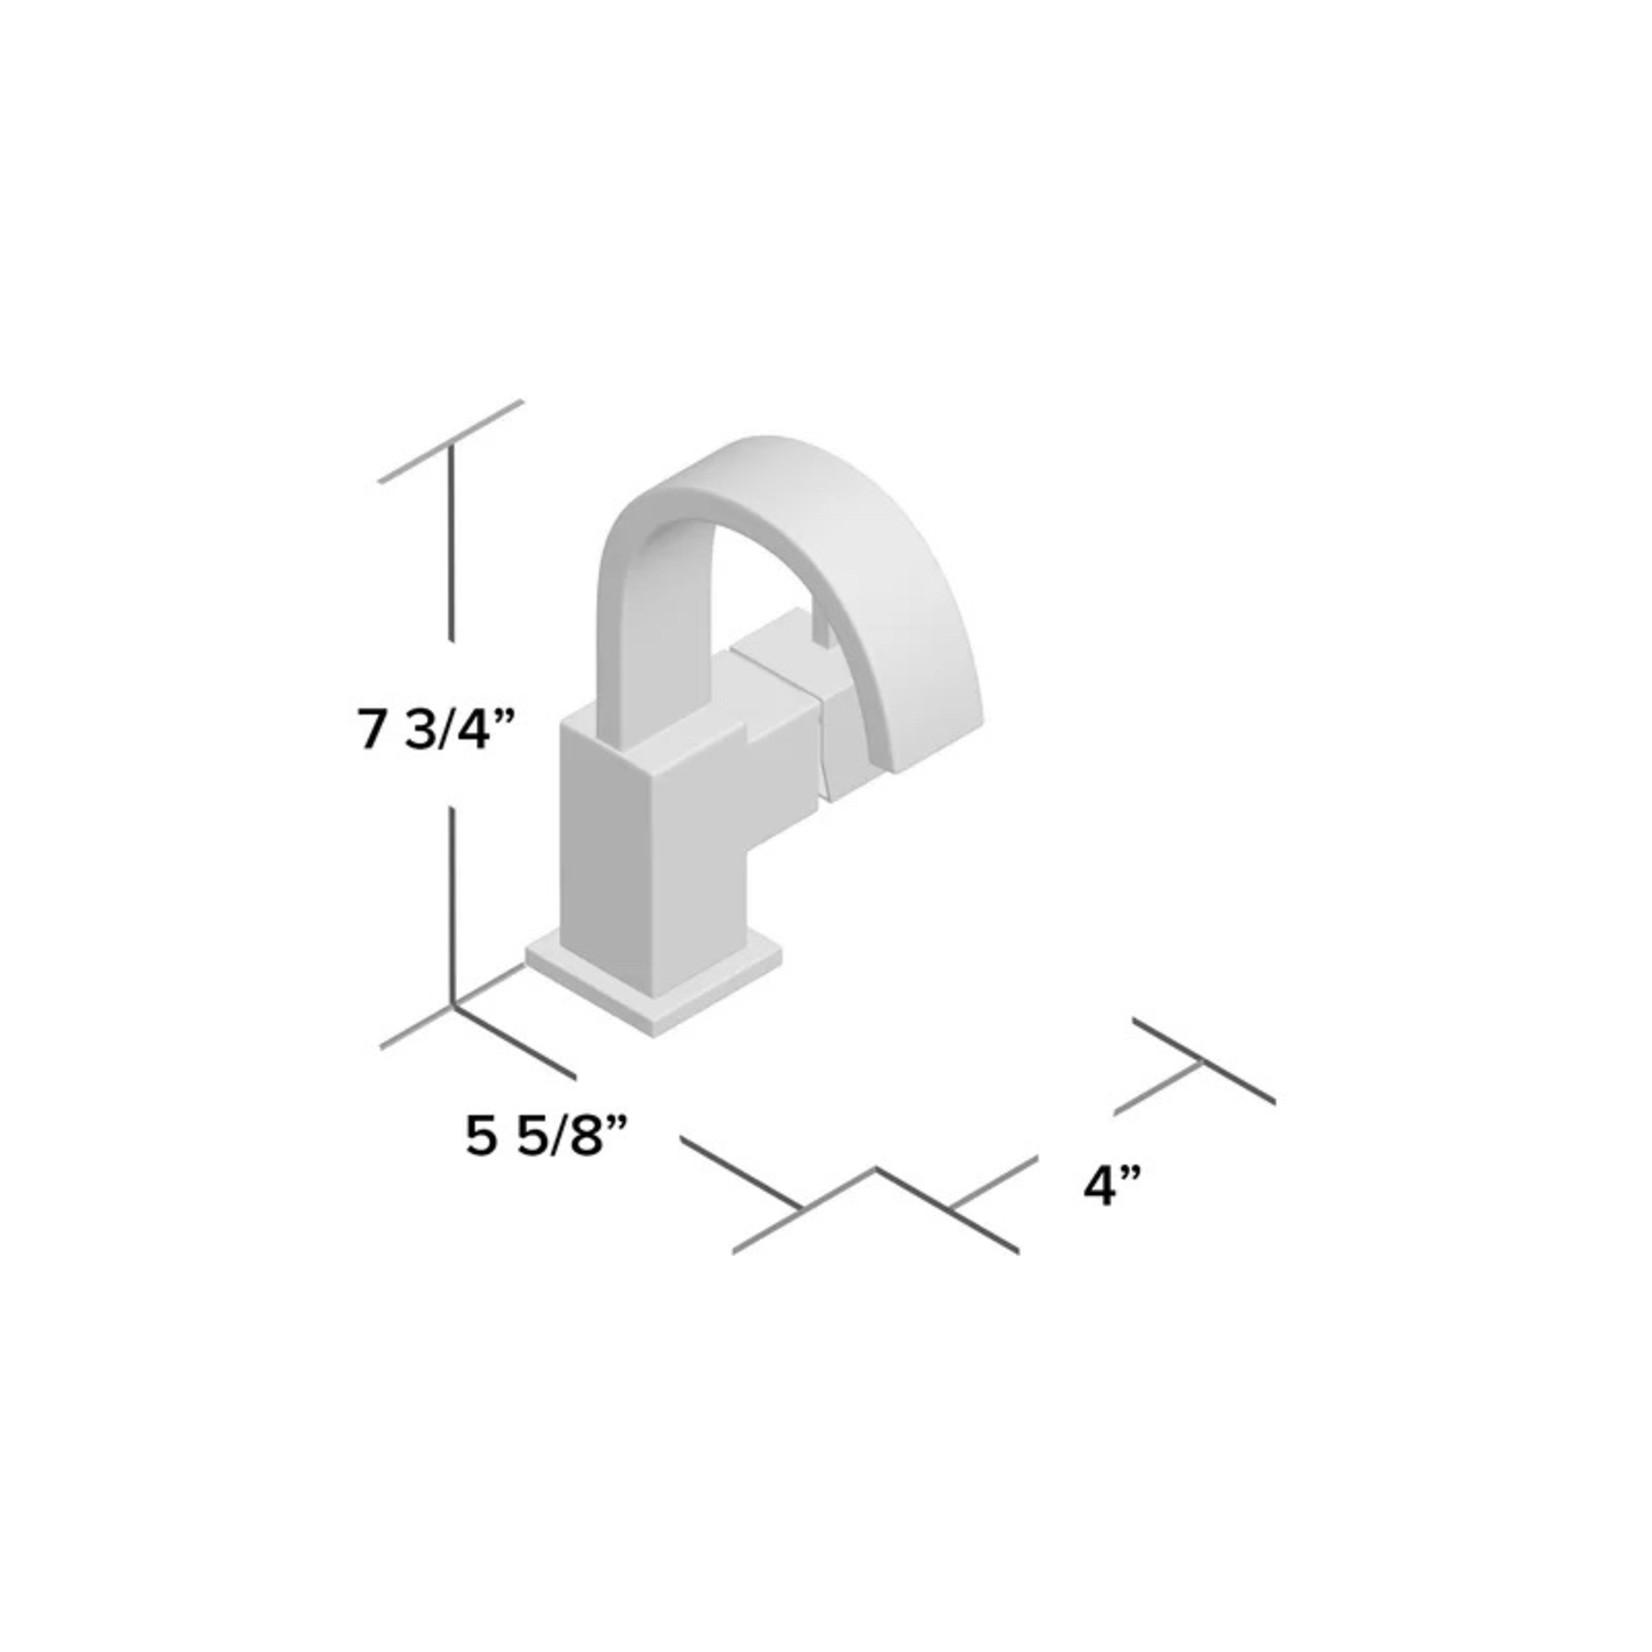 *DELTA Vero Bathroom Faucet - 1-Handle - Chrome - Small Defect